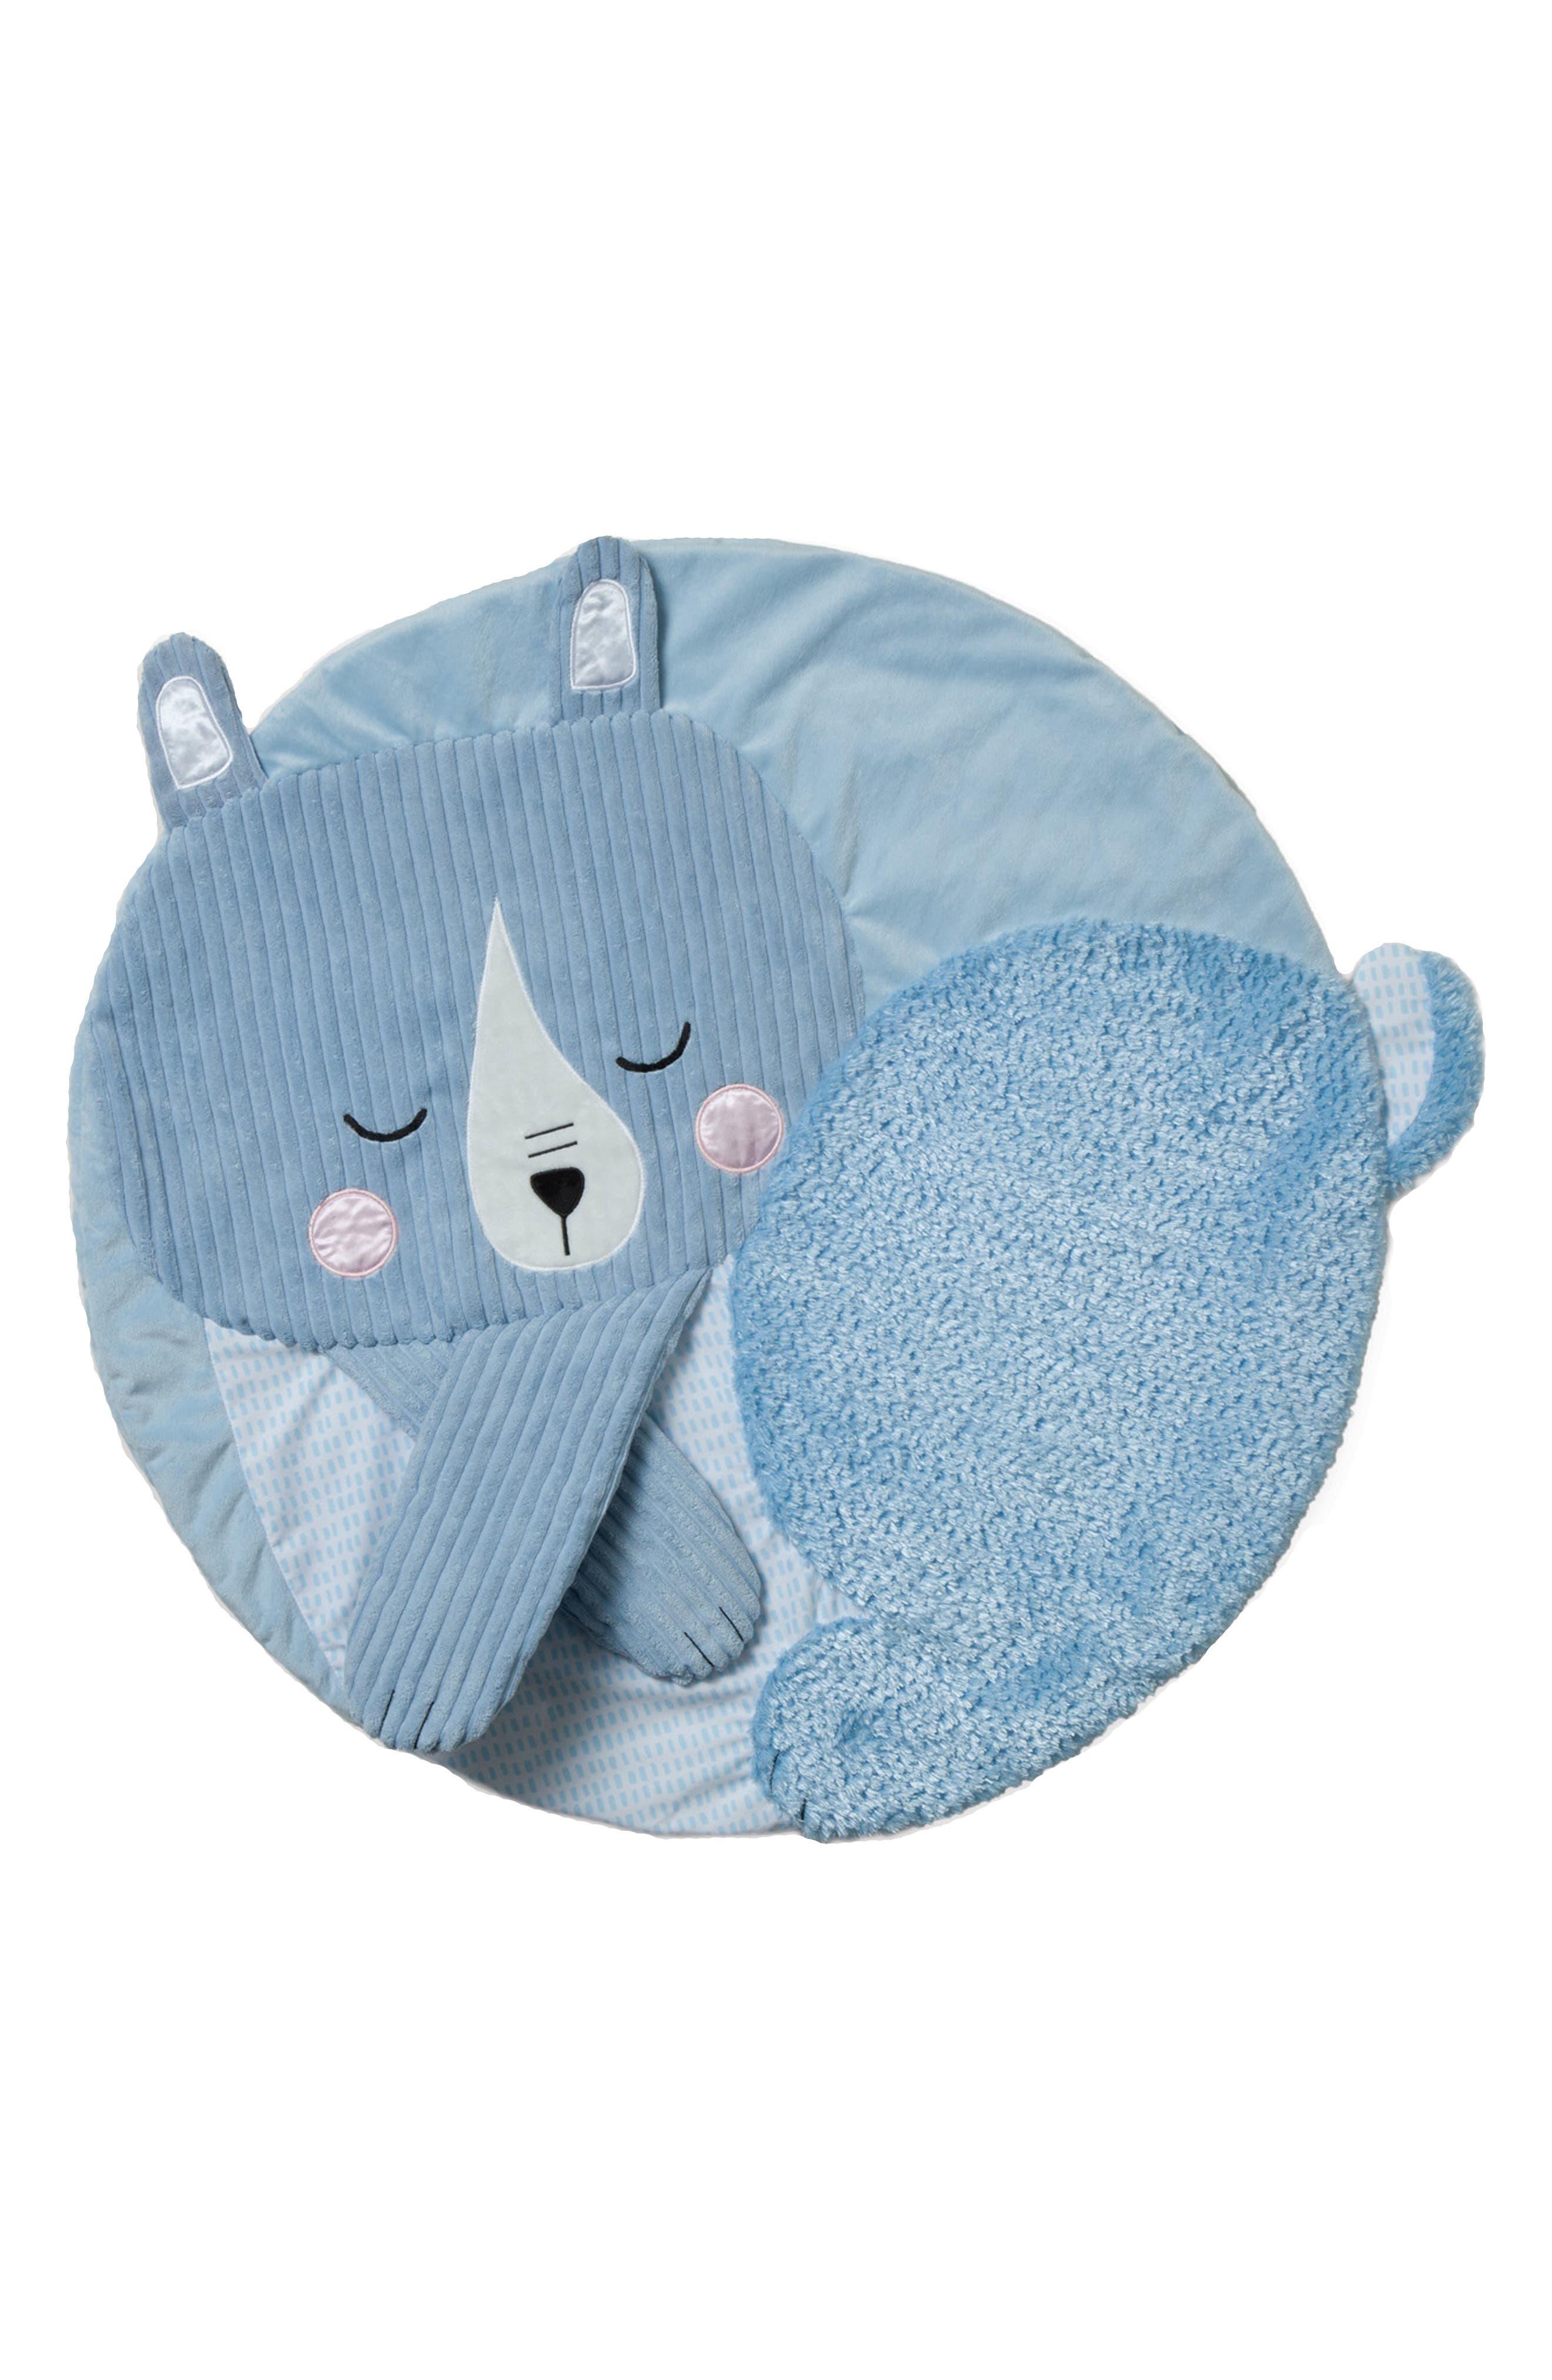 Bear Tactile Playmat,                         Main,                         color,